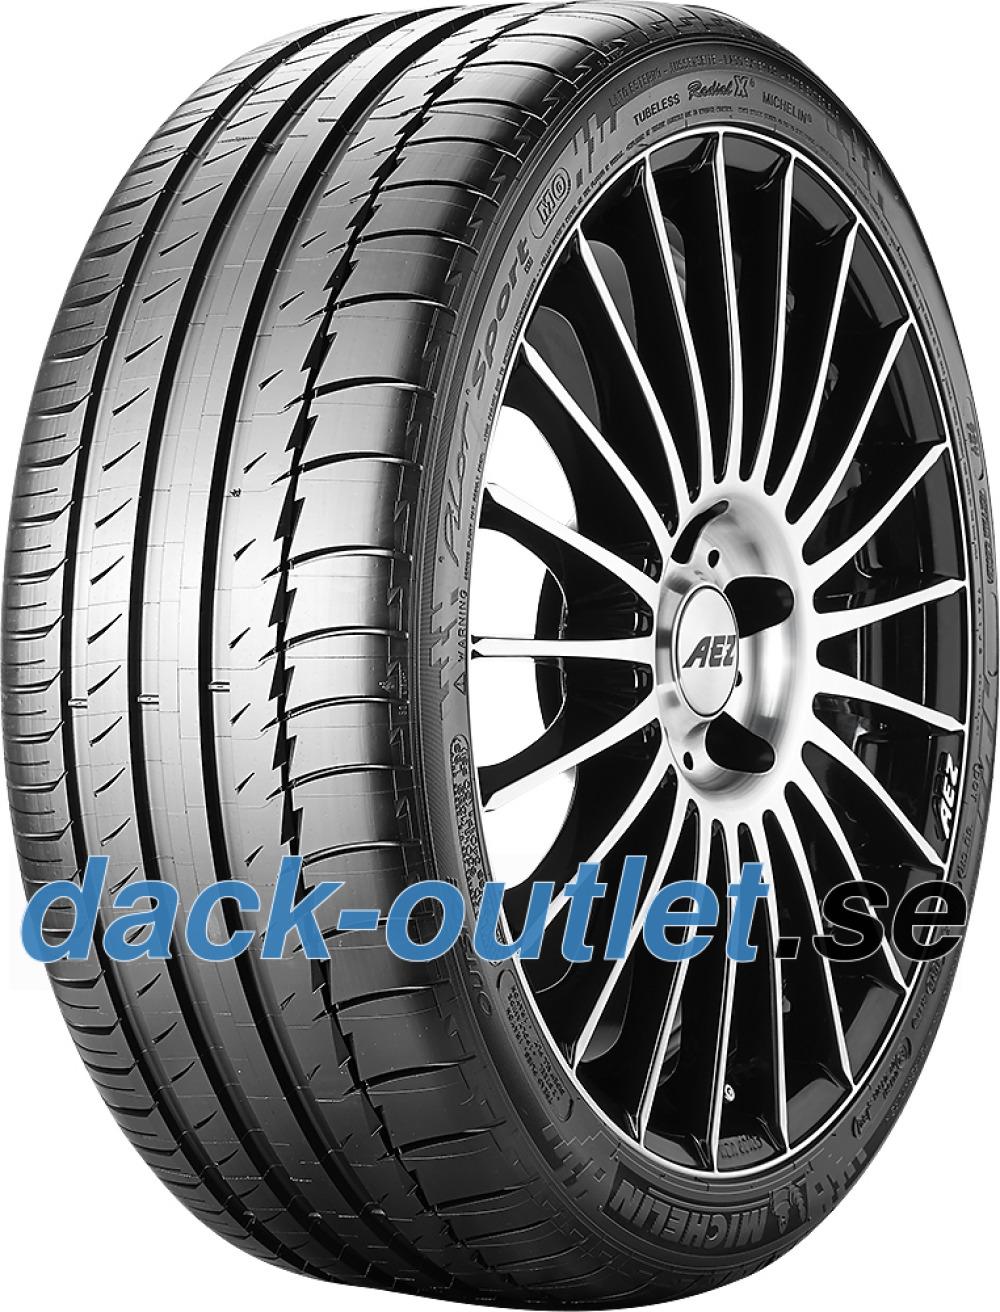 Michelin Pilot Sport PS2 ( 335/30 ZR20 (104Y) med fälg skyddslist (FSL), N2 )